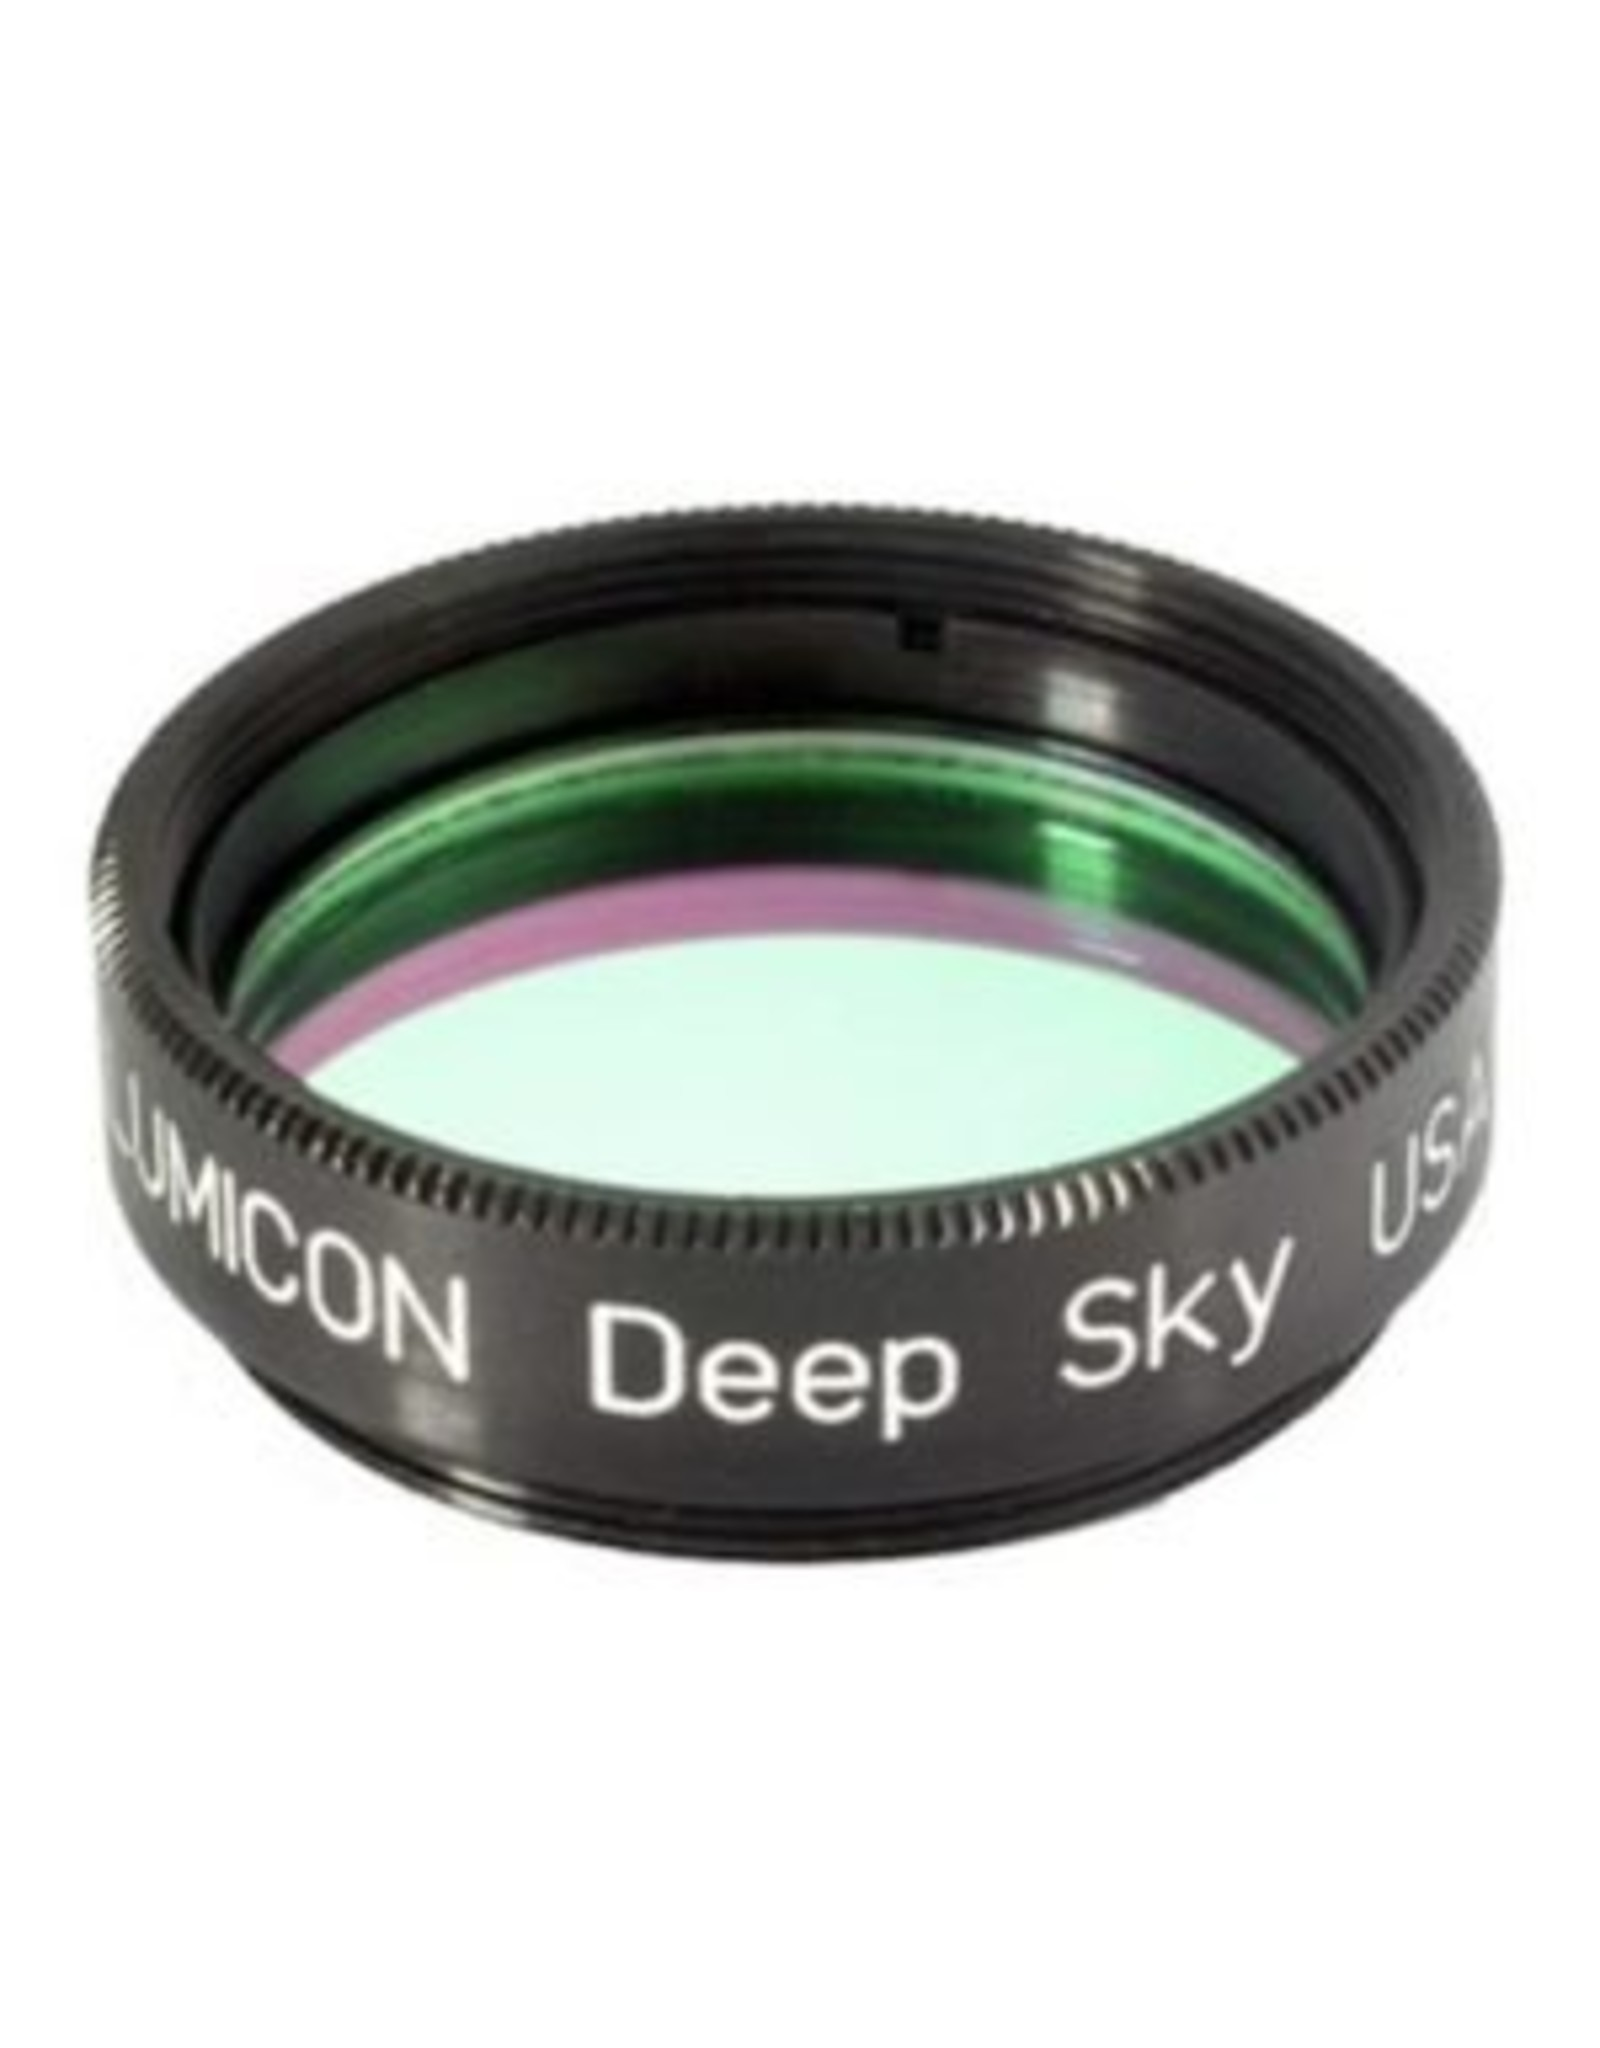 Lumicon Lumicon 1.25 Deep Sky Light Pollution Nebula Filter